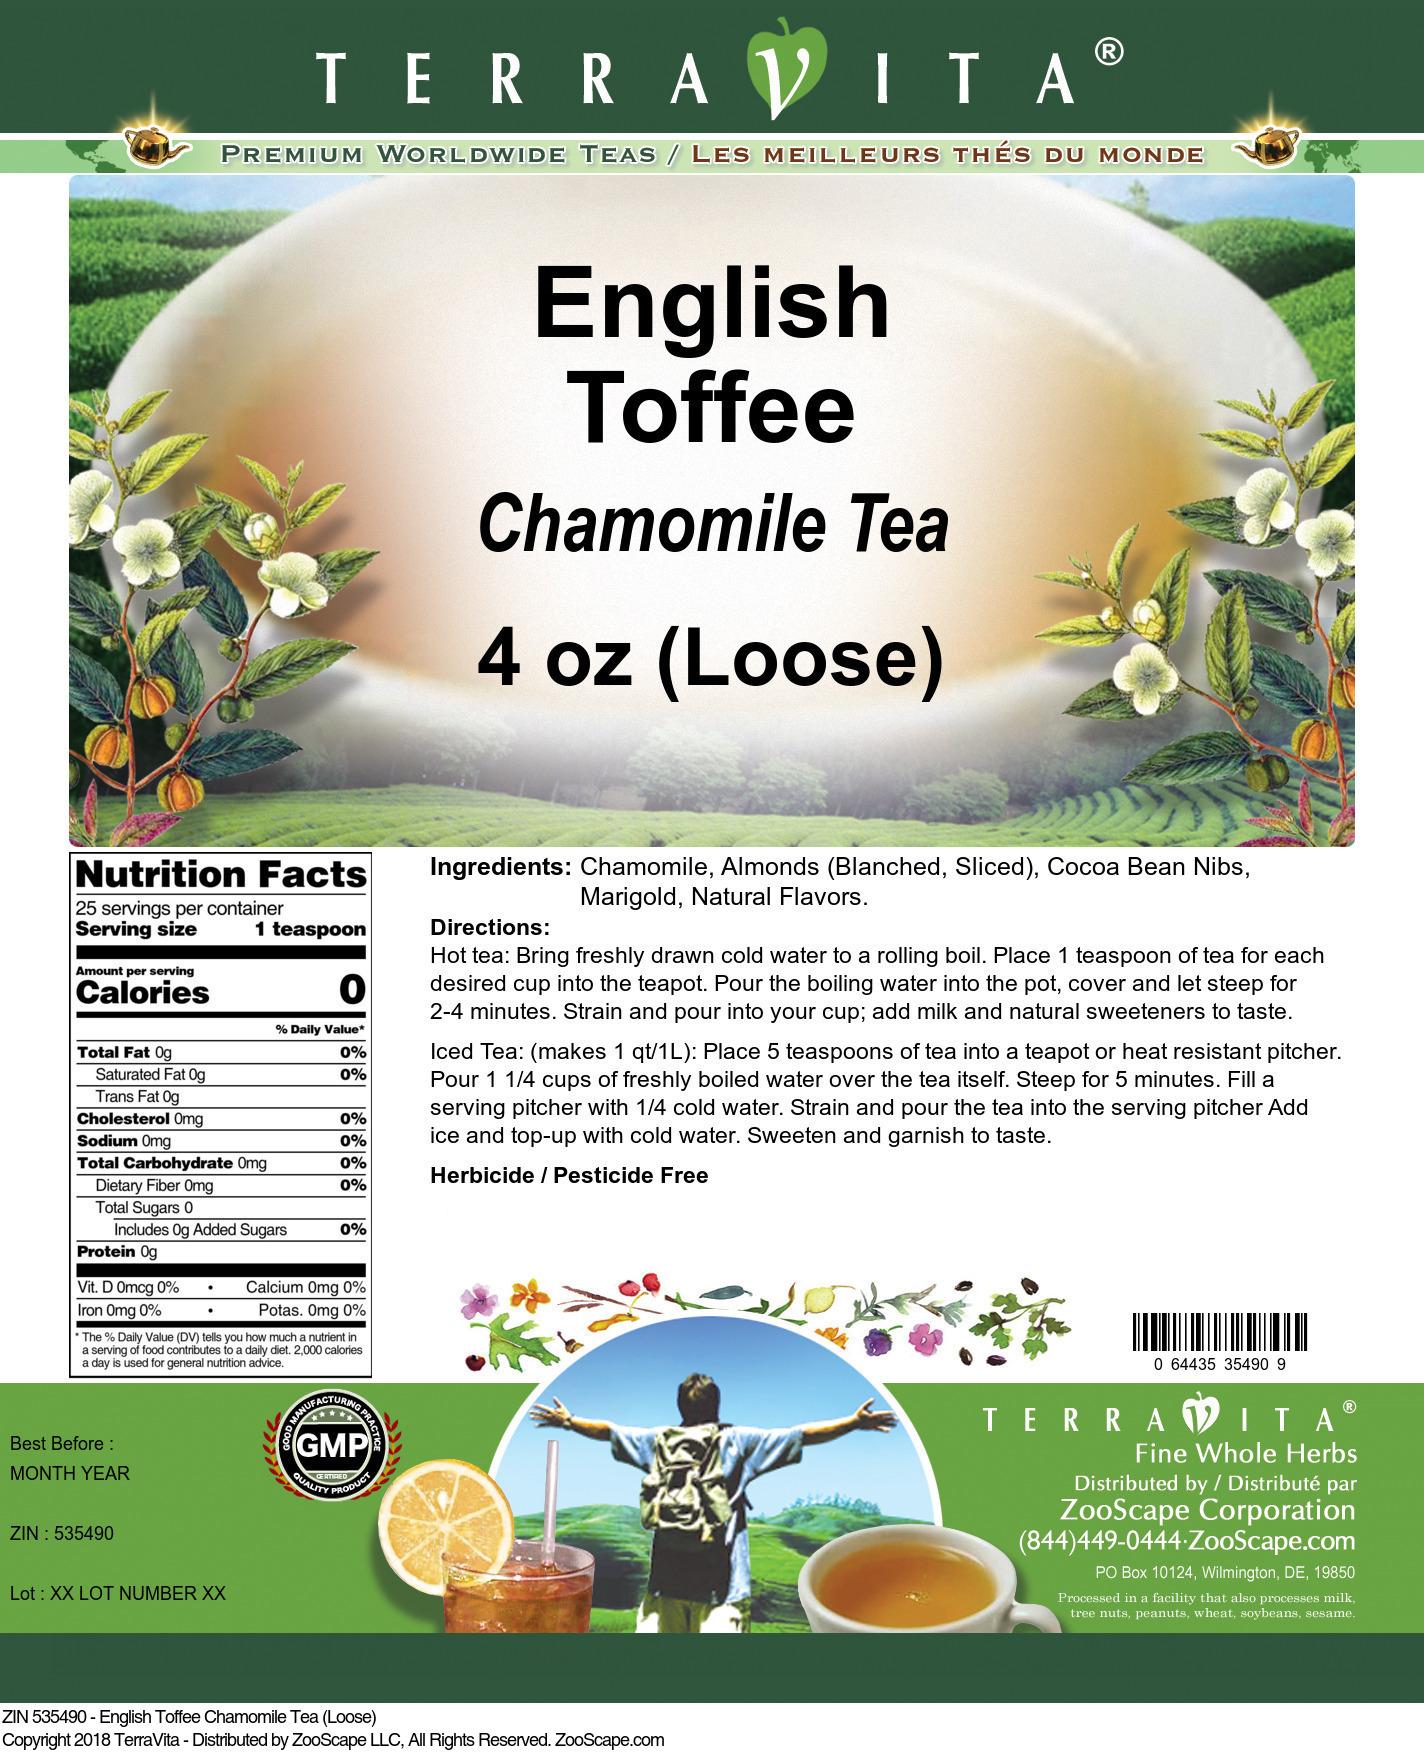 English Toffee Chamomile Tea (Loose)